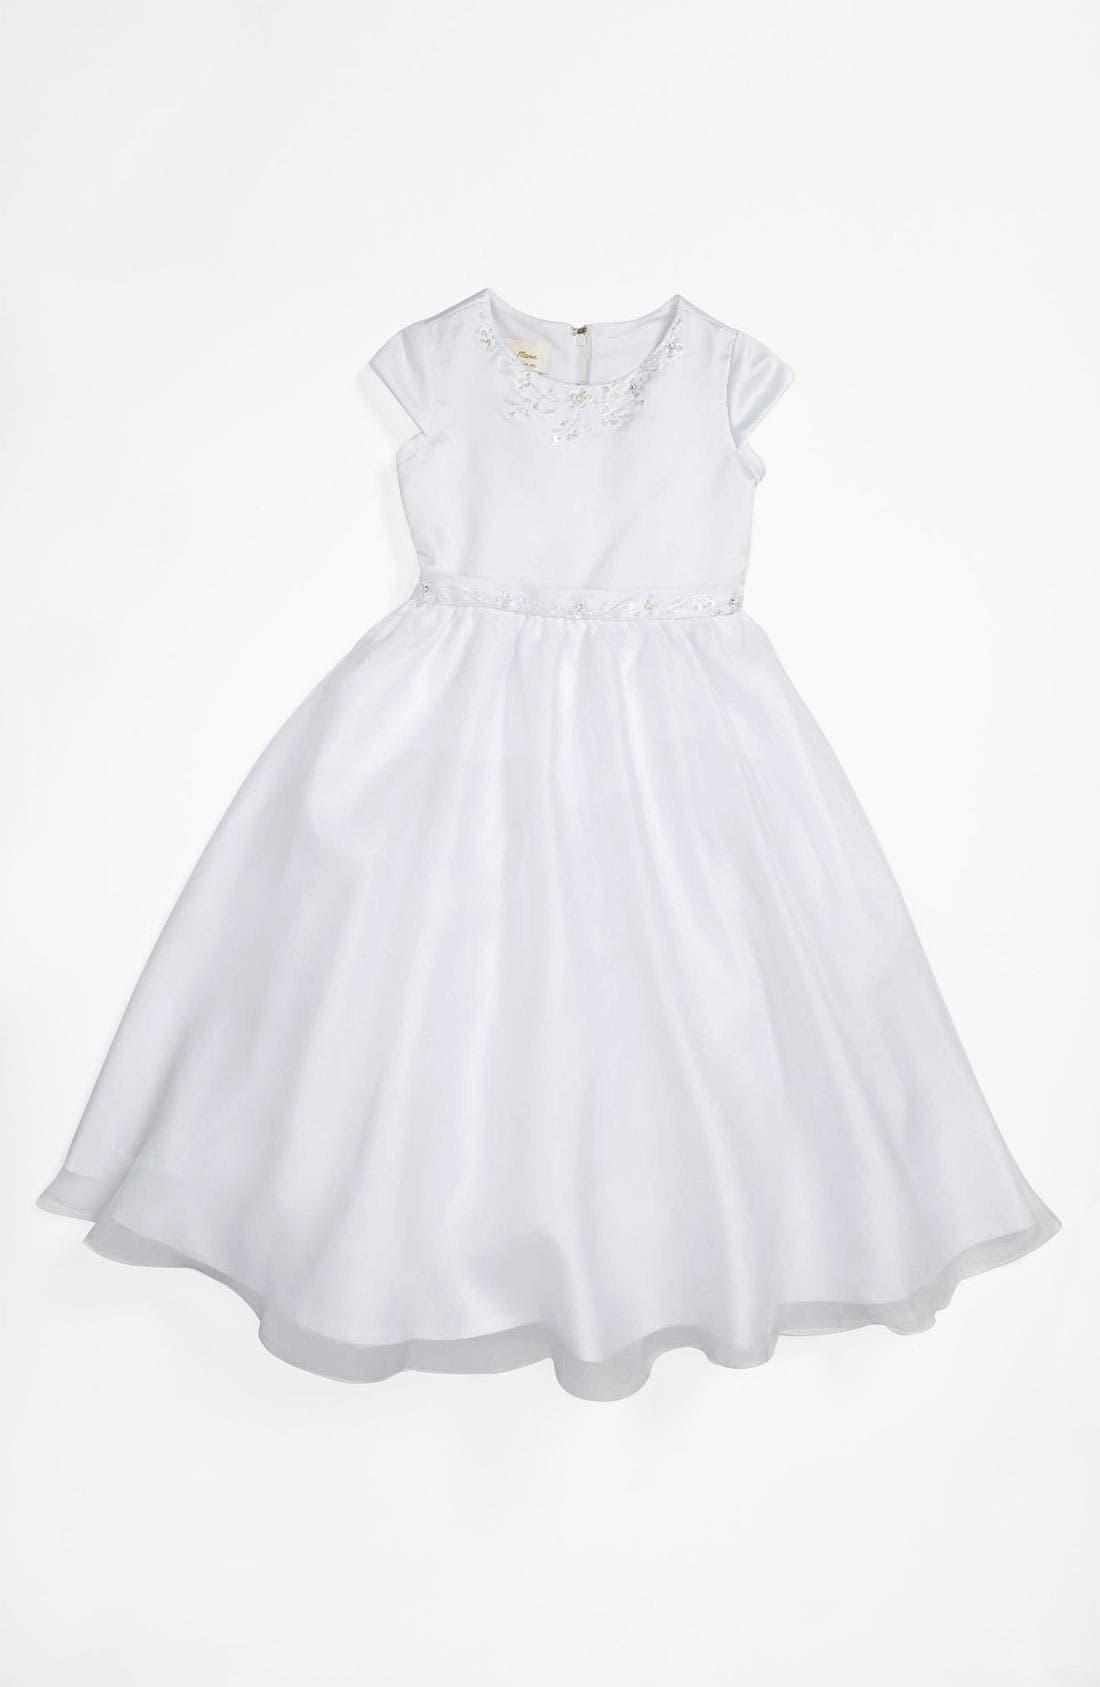 Main Image - Lauren Marie Beaded Dress (Little Girls & Big Girls)